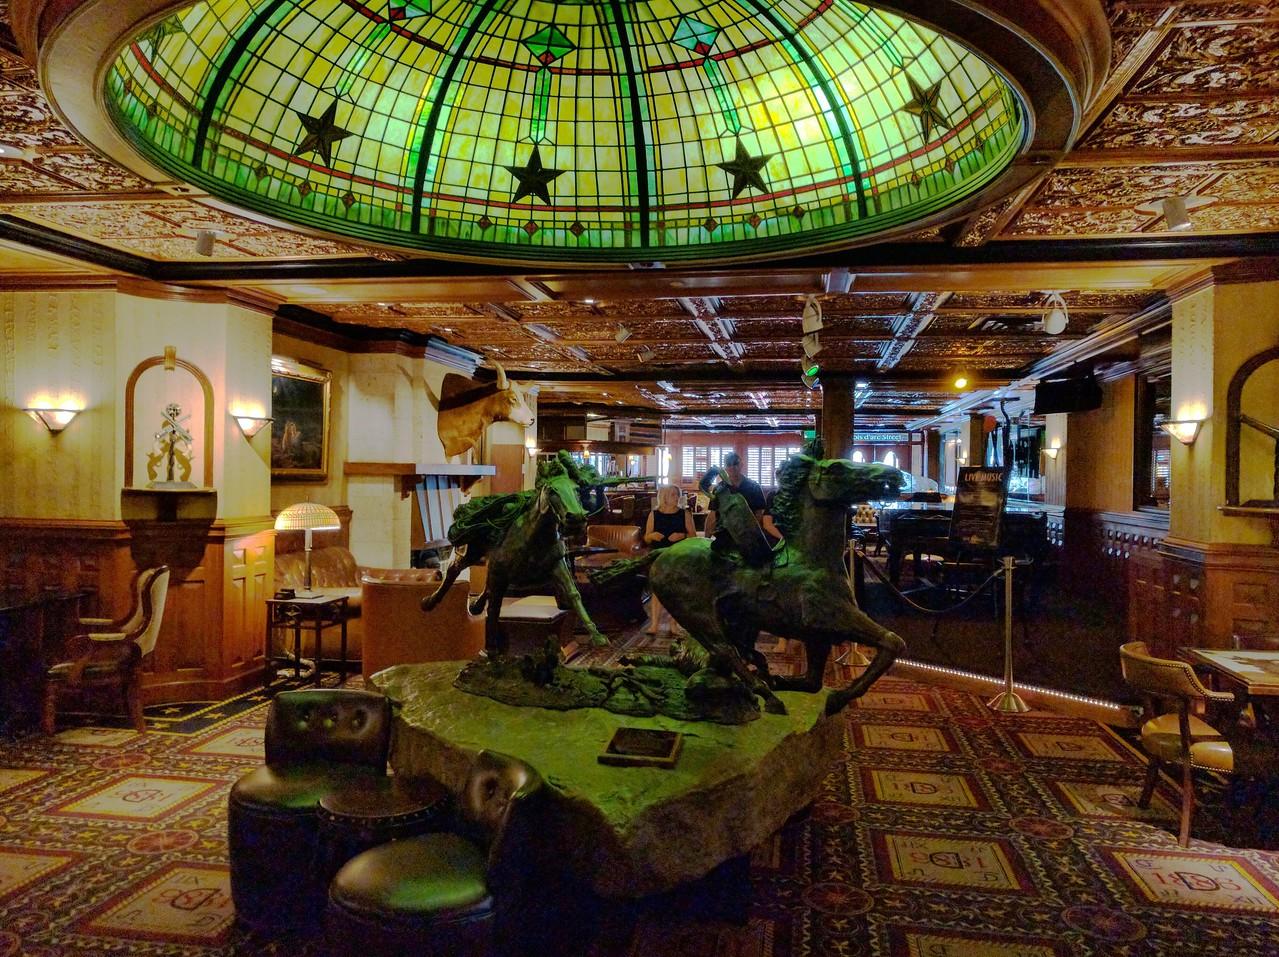 076 - Austin - Driskill Hotel Lounge